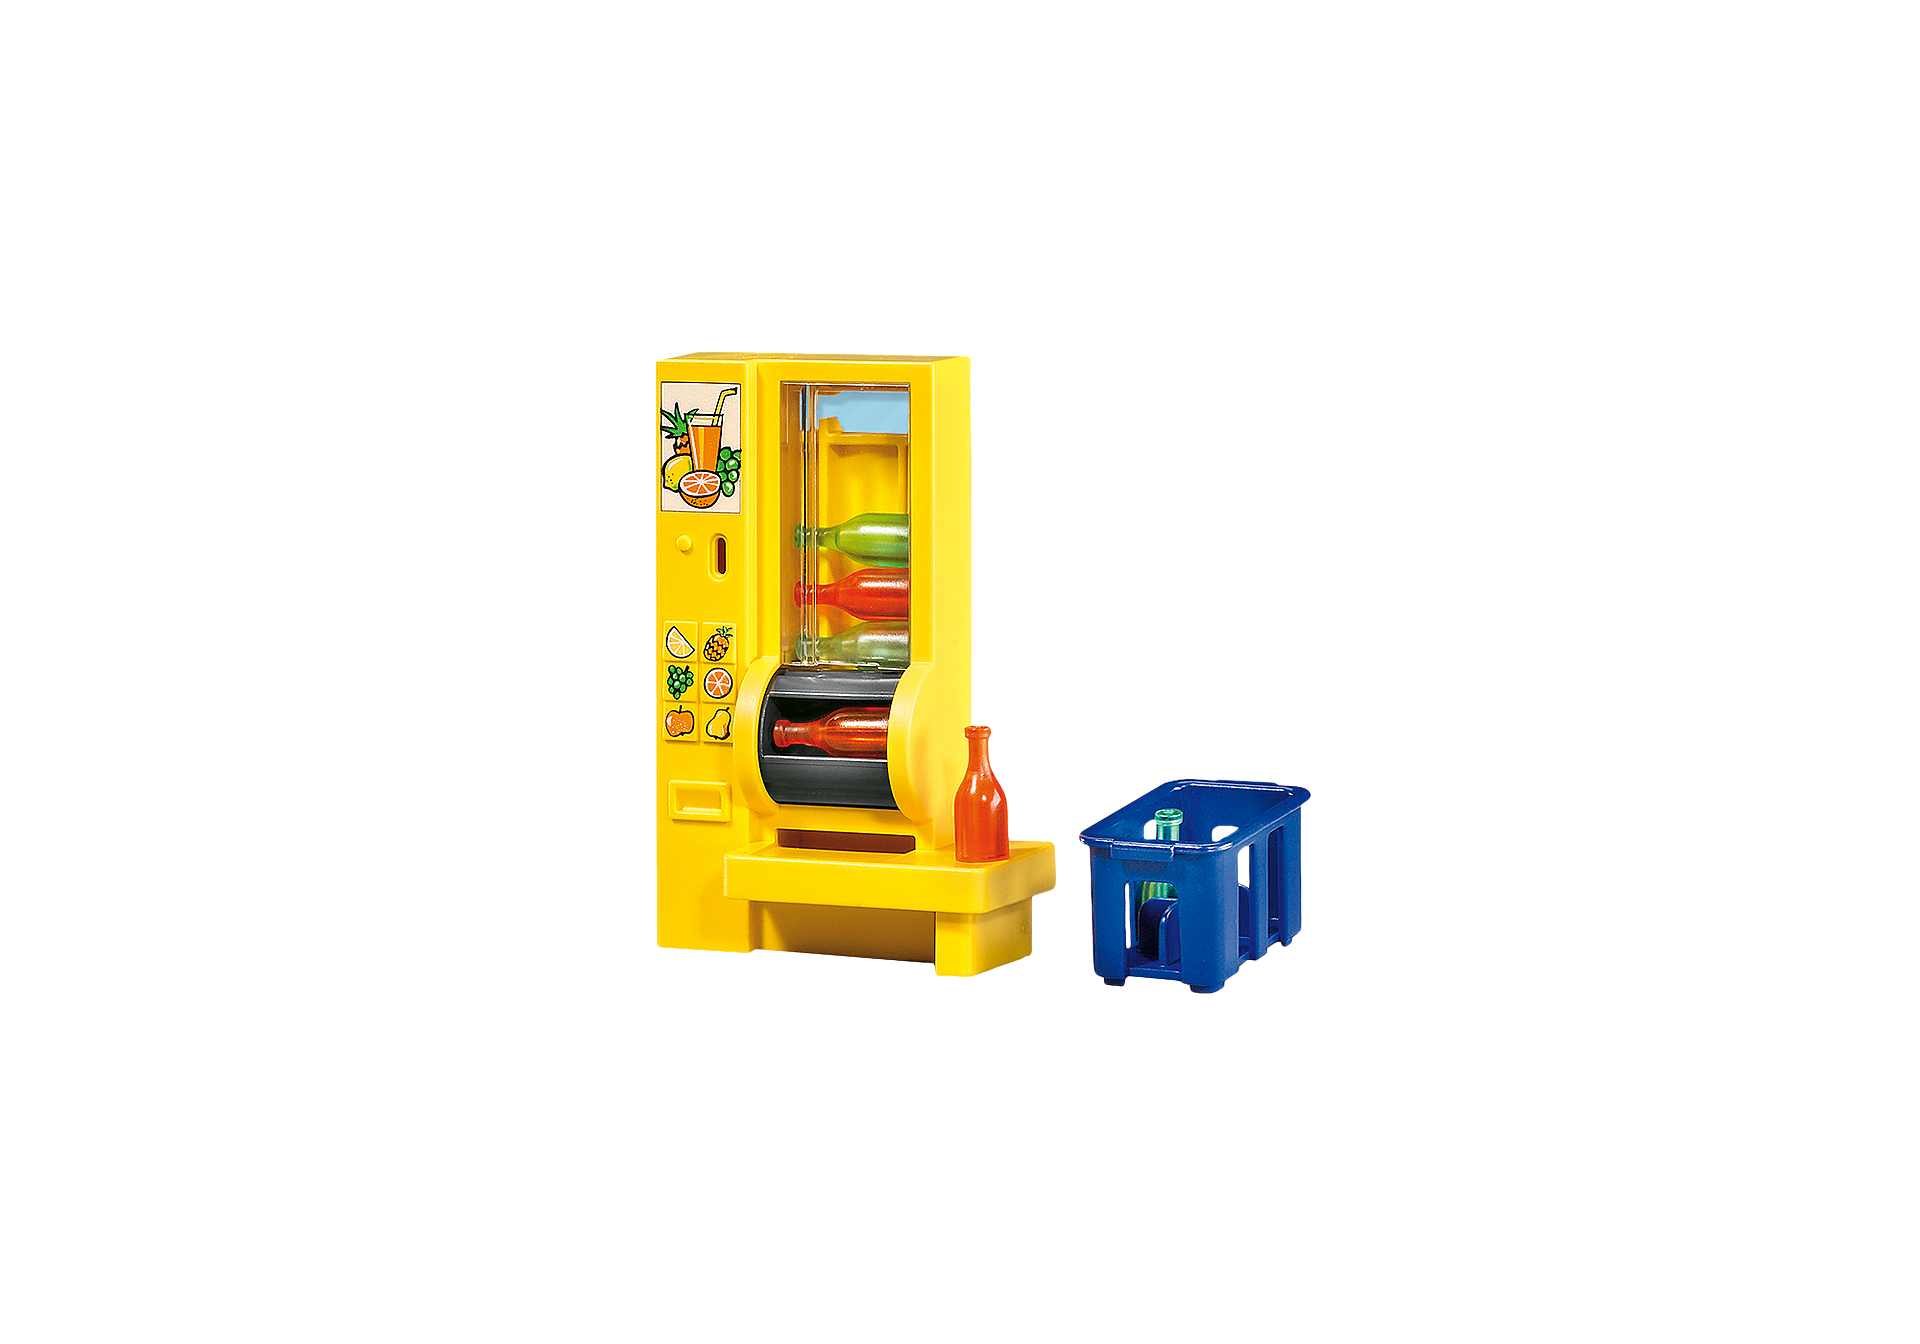 7931 Drankenautomaat zoom image1